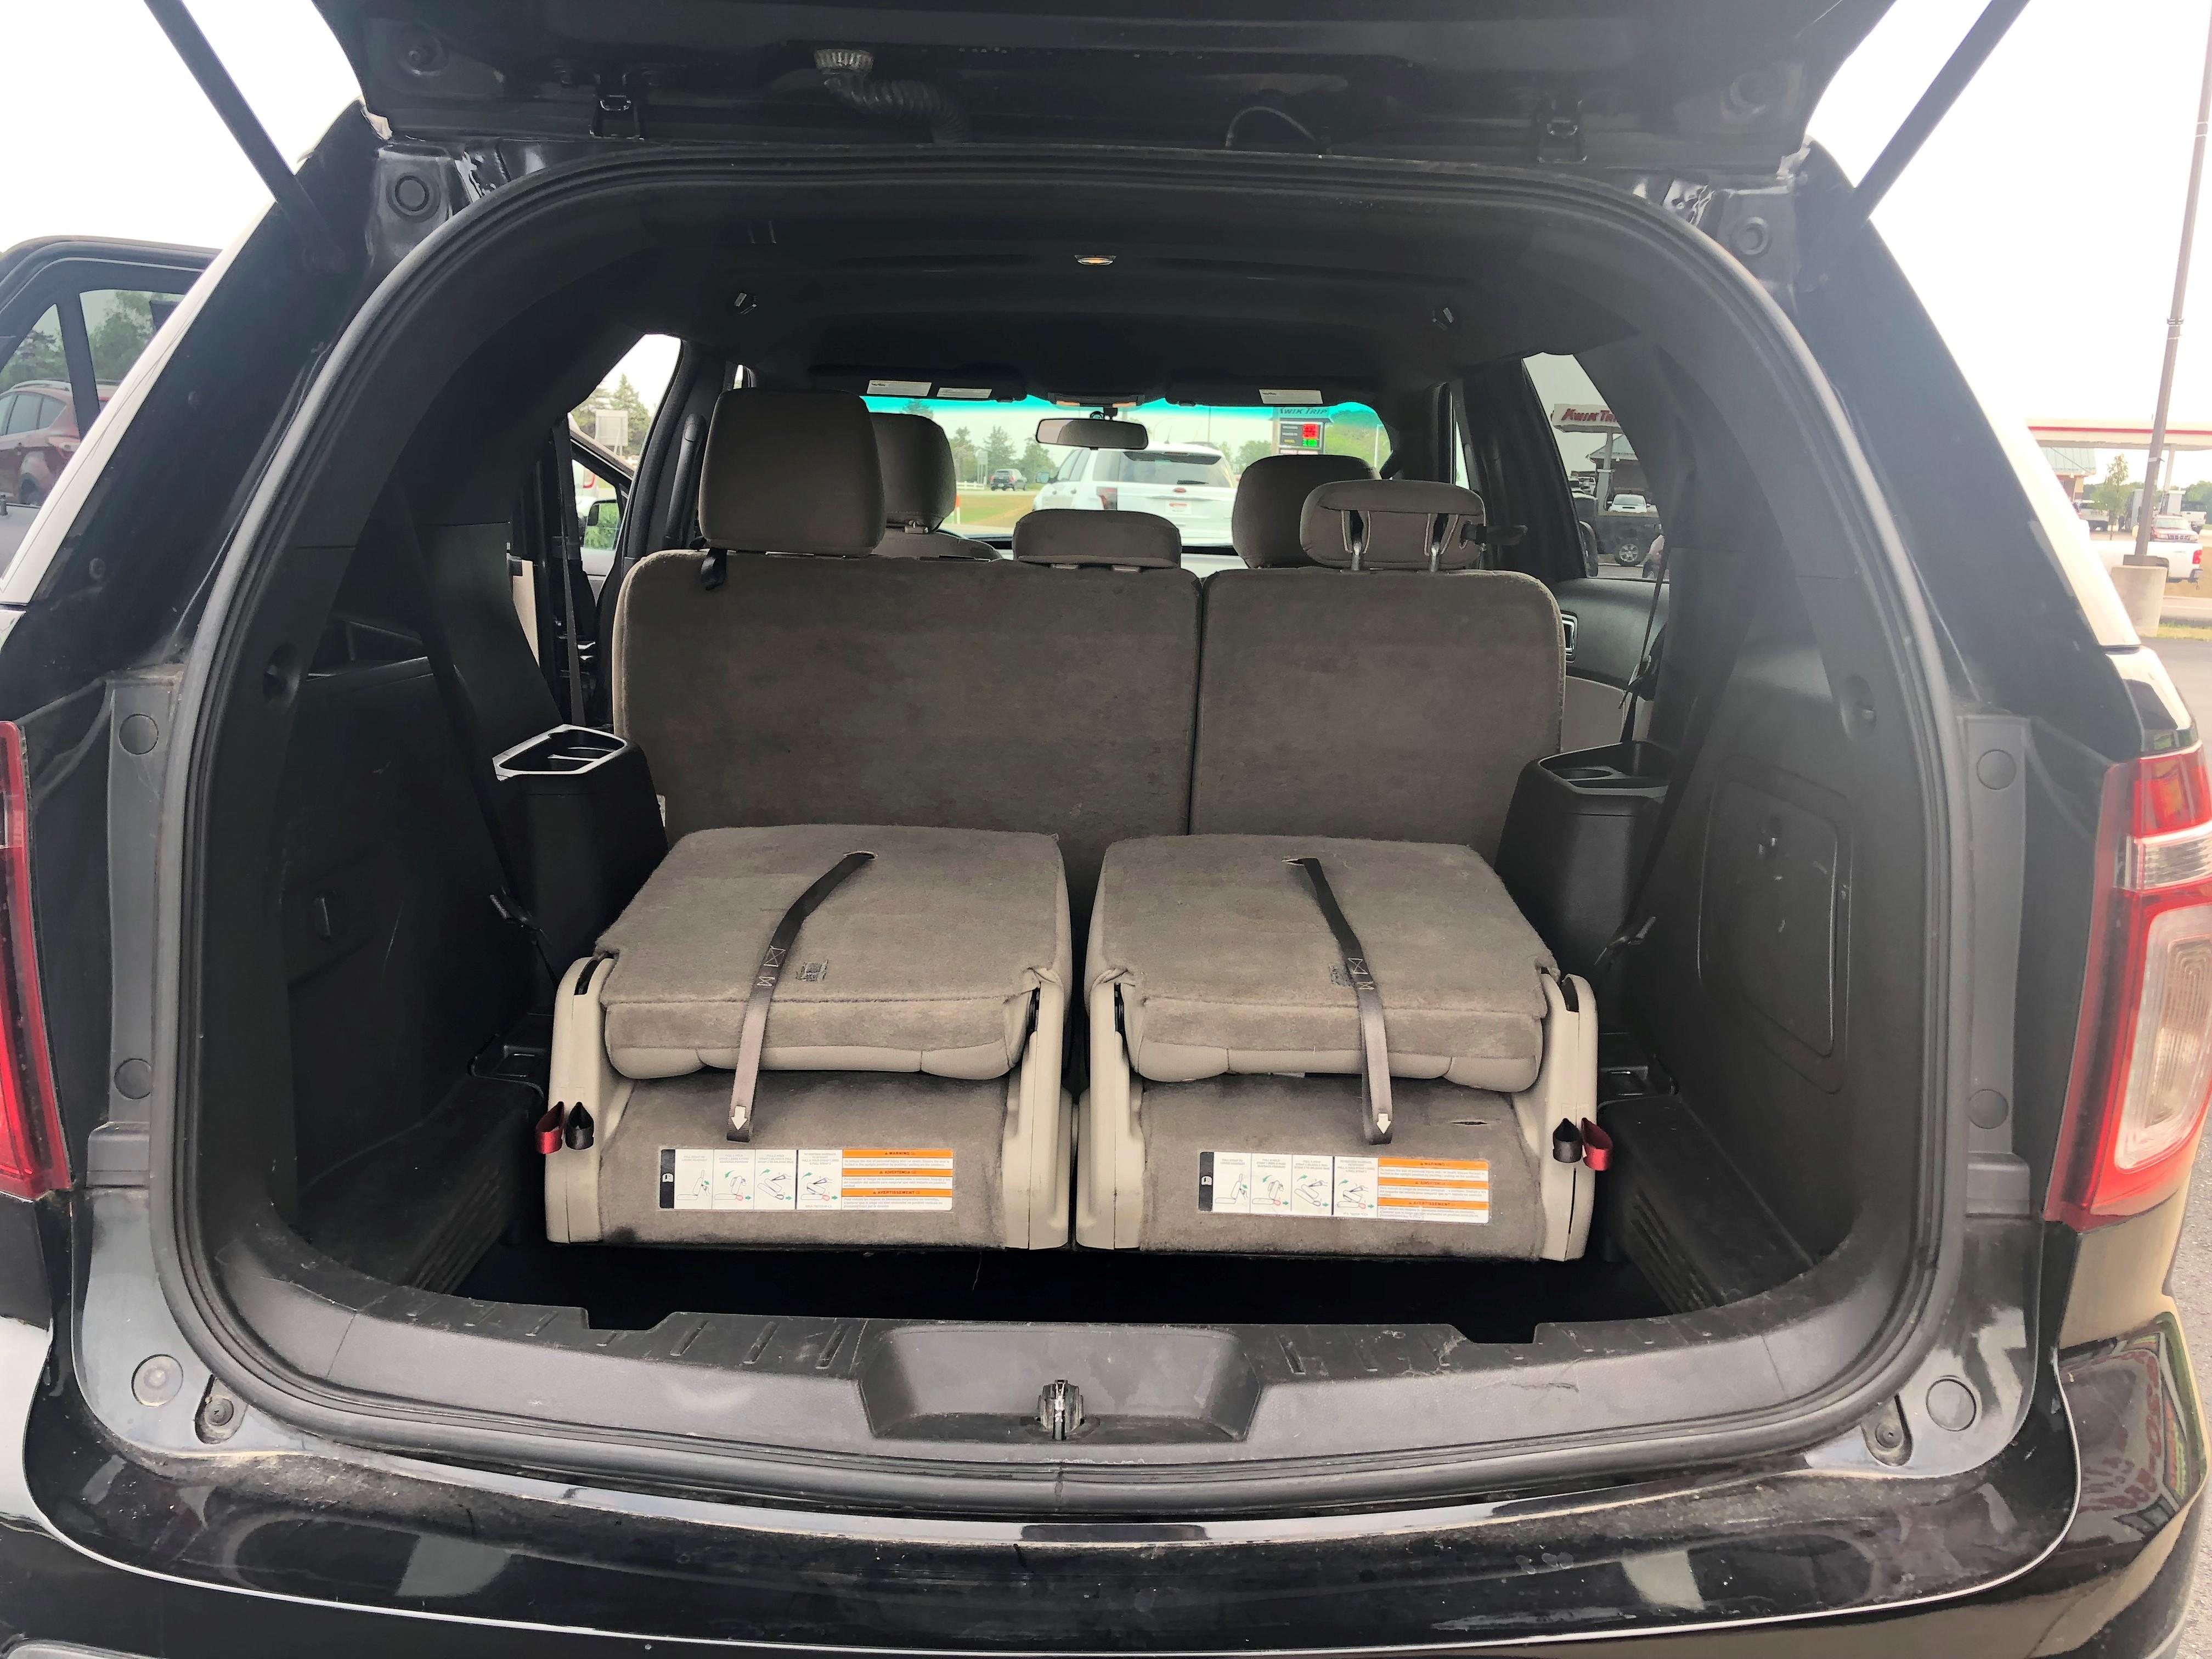 used vehicle - SUV FORD EXPLORER 2013